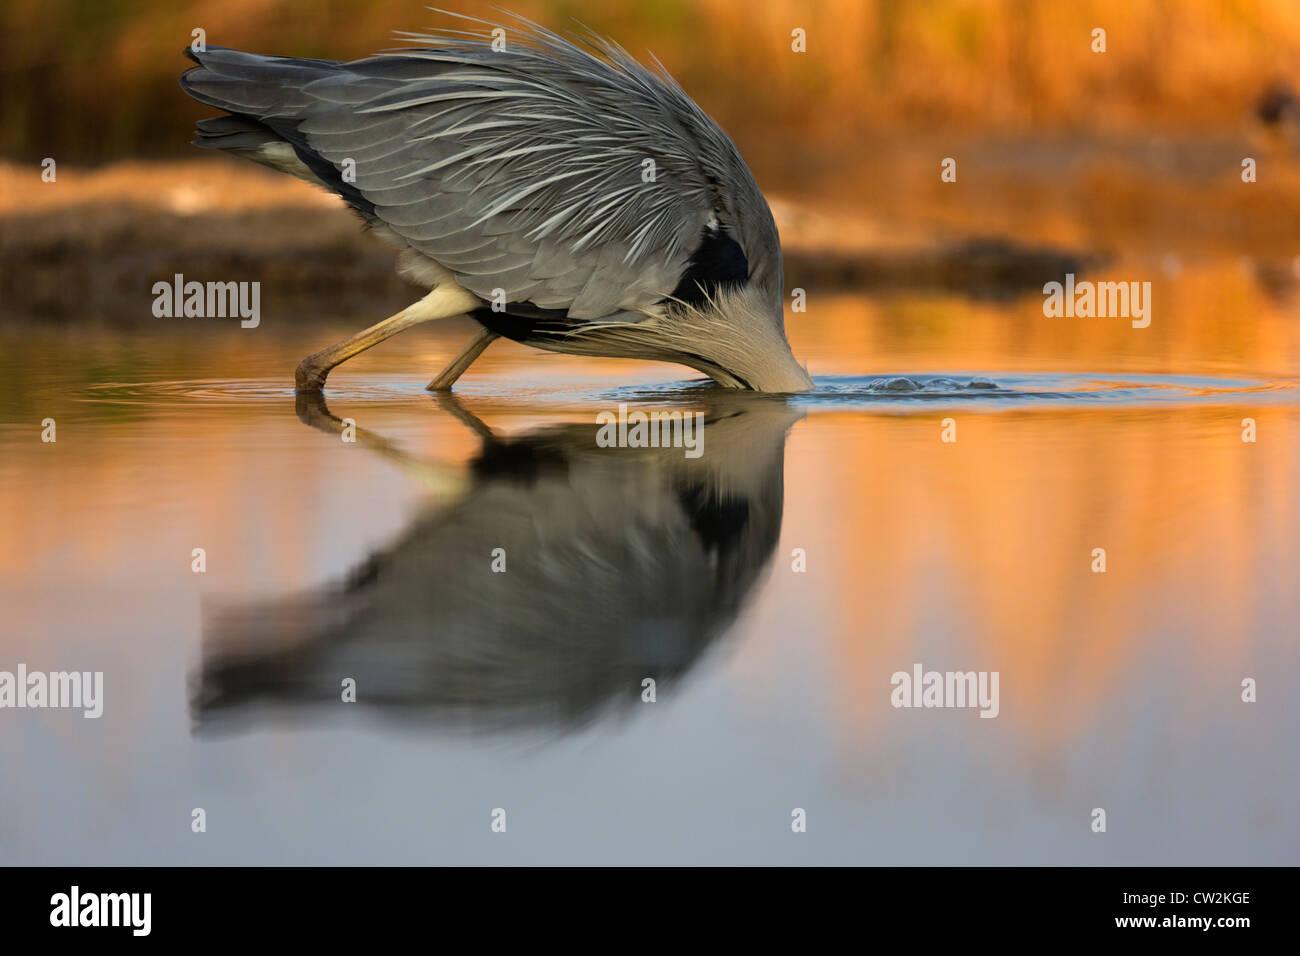 Grau Heron(Ardea cinerea) Tauchen nach Beute. Hungrige Stockbild